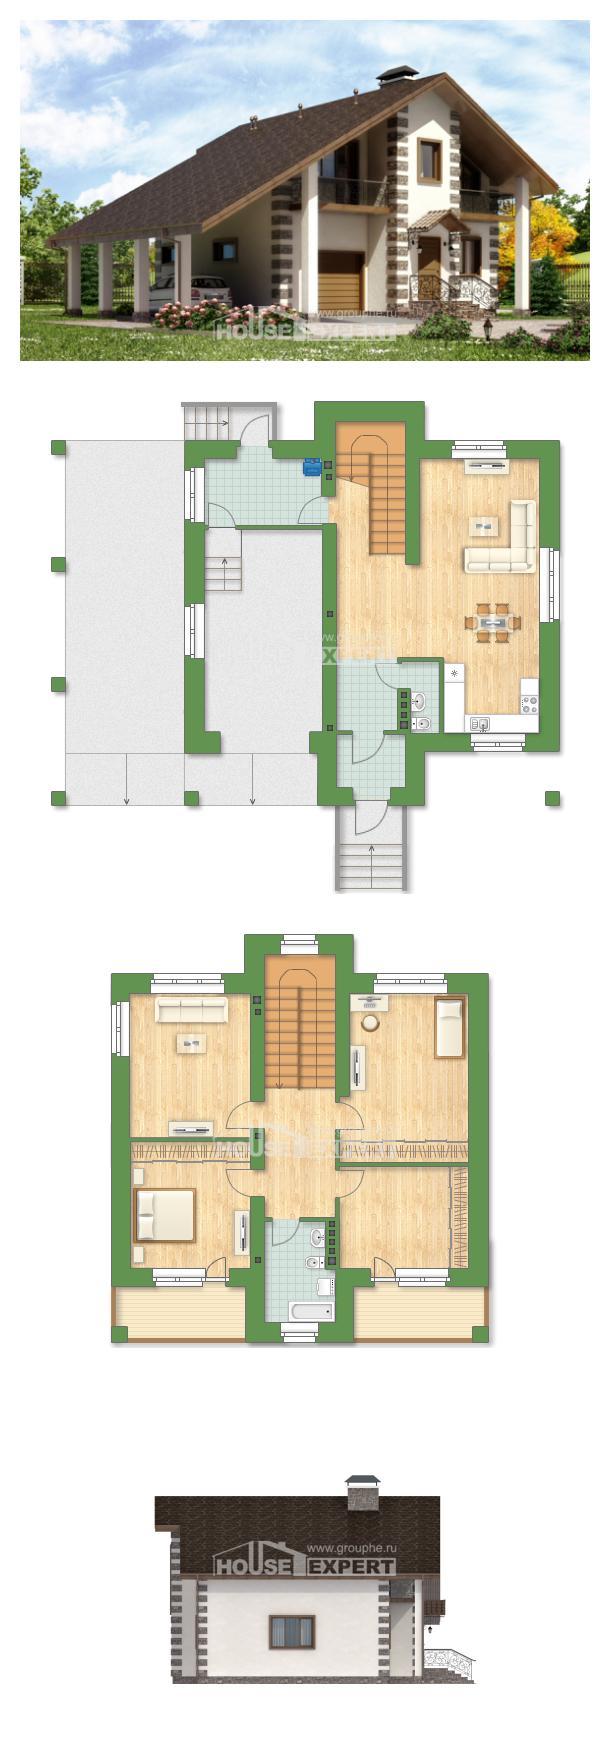 Проект дома 150-003-Л | House Expert